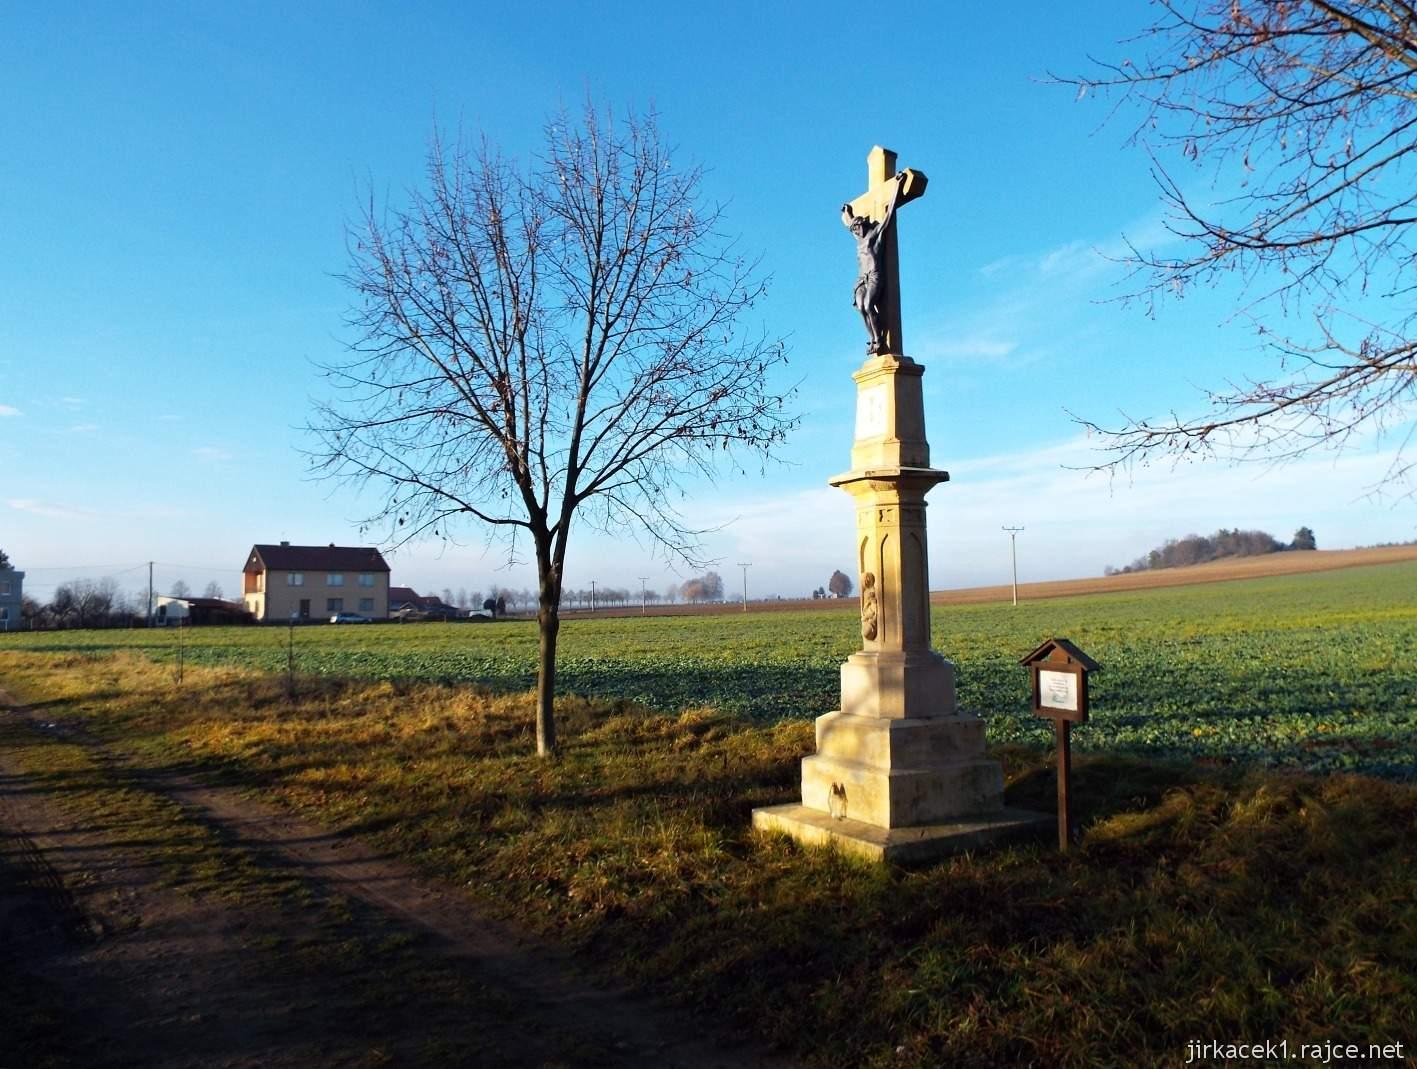 081 - Kříž s Kristem na okraji Krumsína nedaleko desáté keše